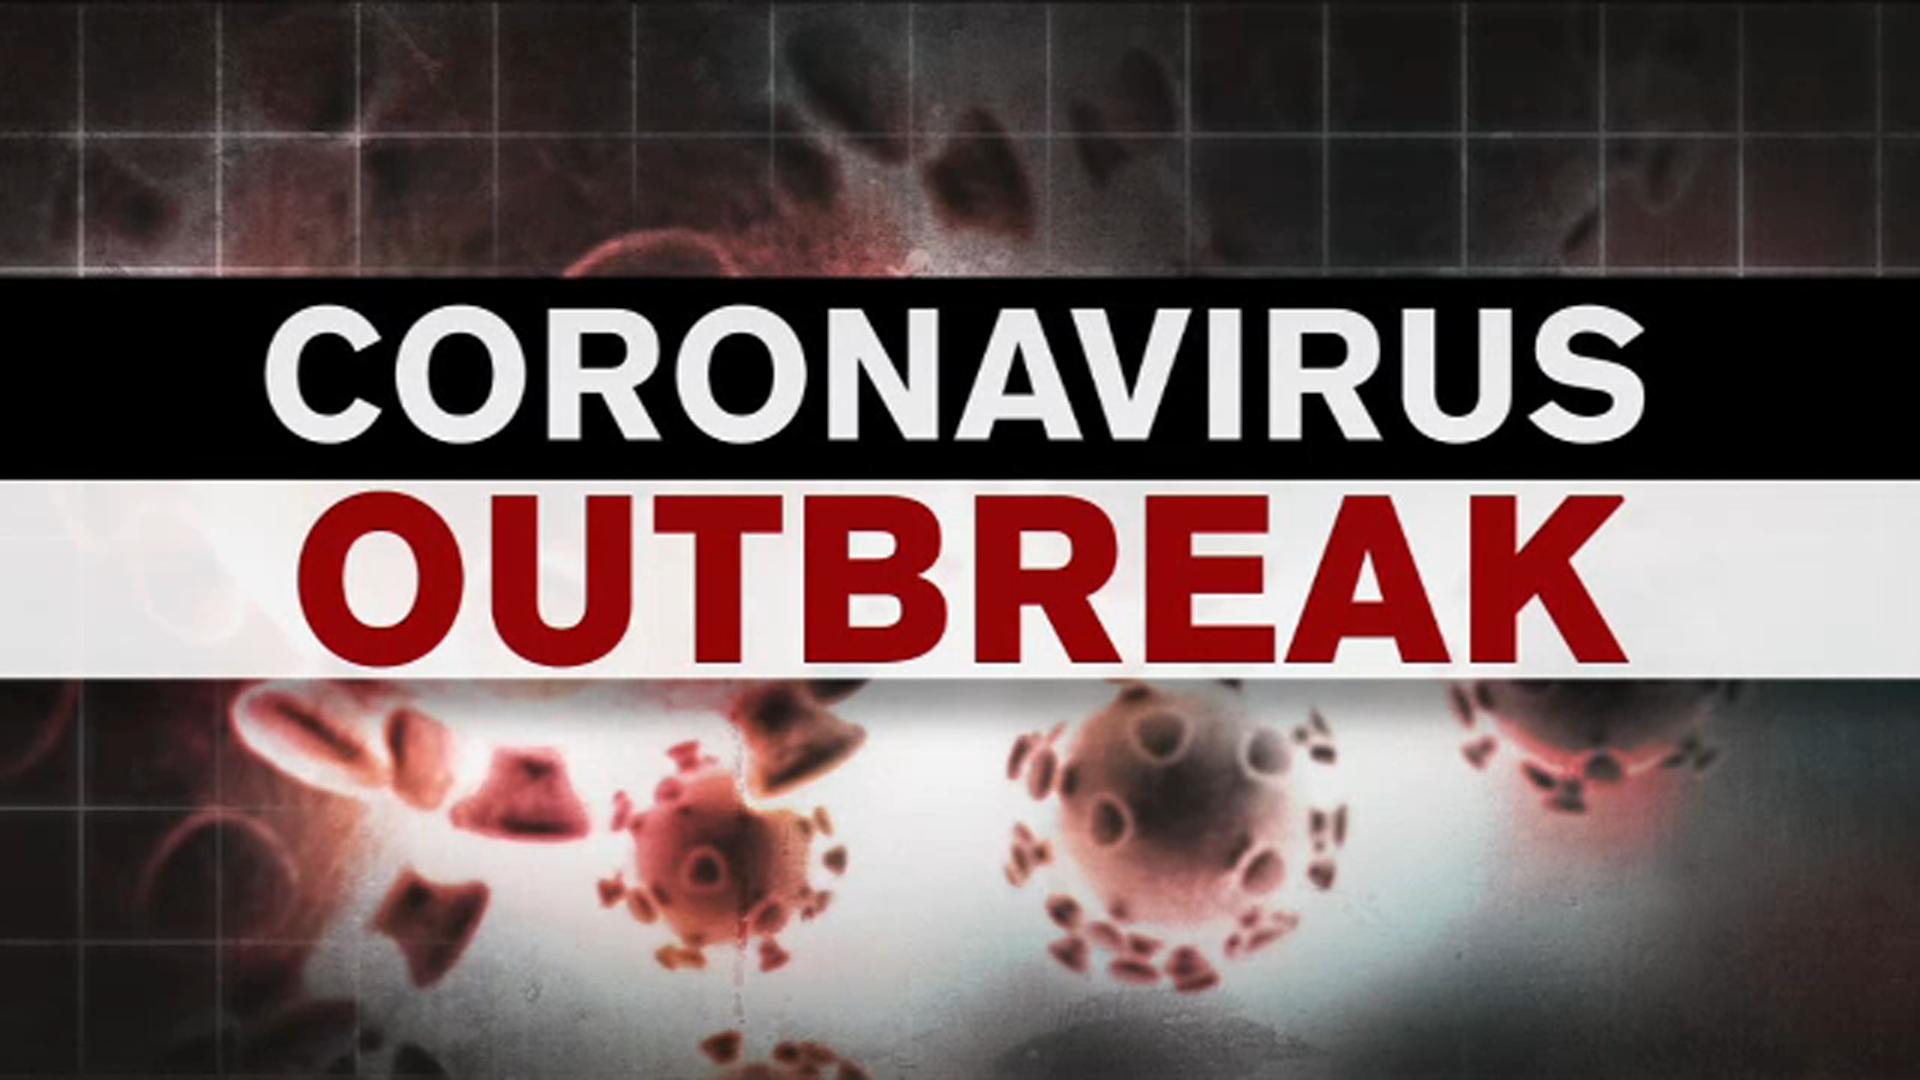 UC Health confirms 4 positive COVID-19 coronavirus cases